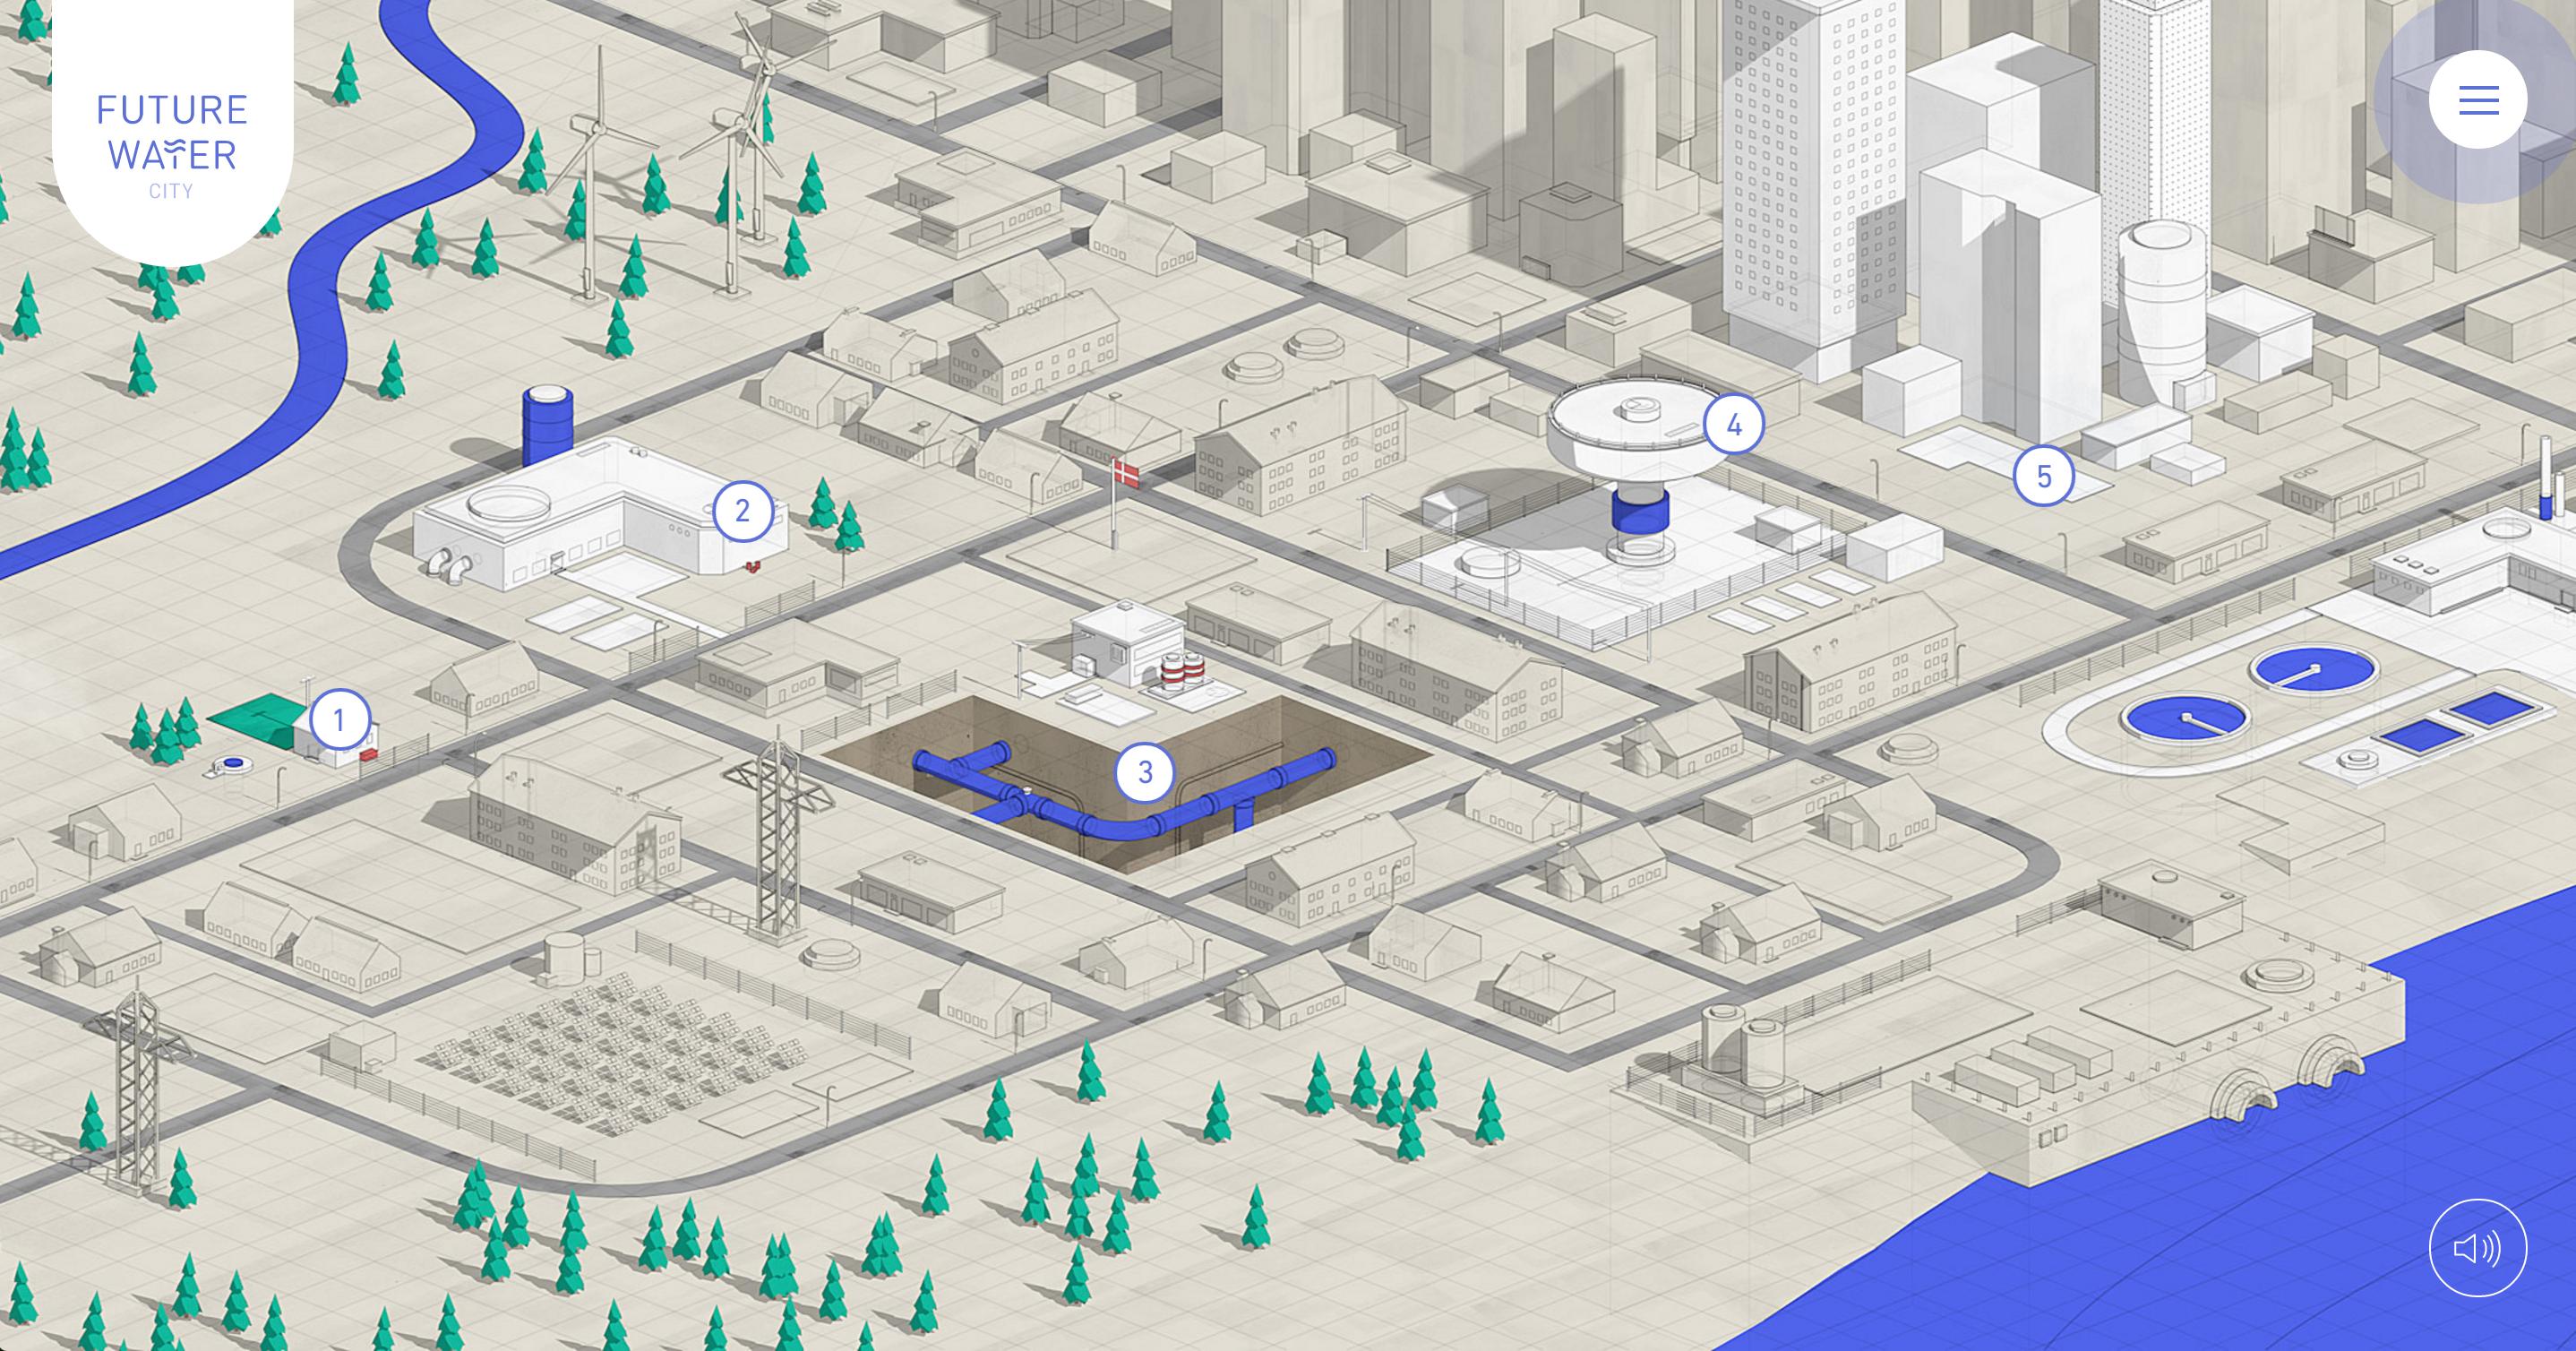 futurewatercity.com: